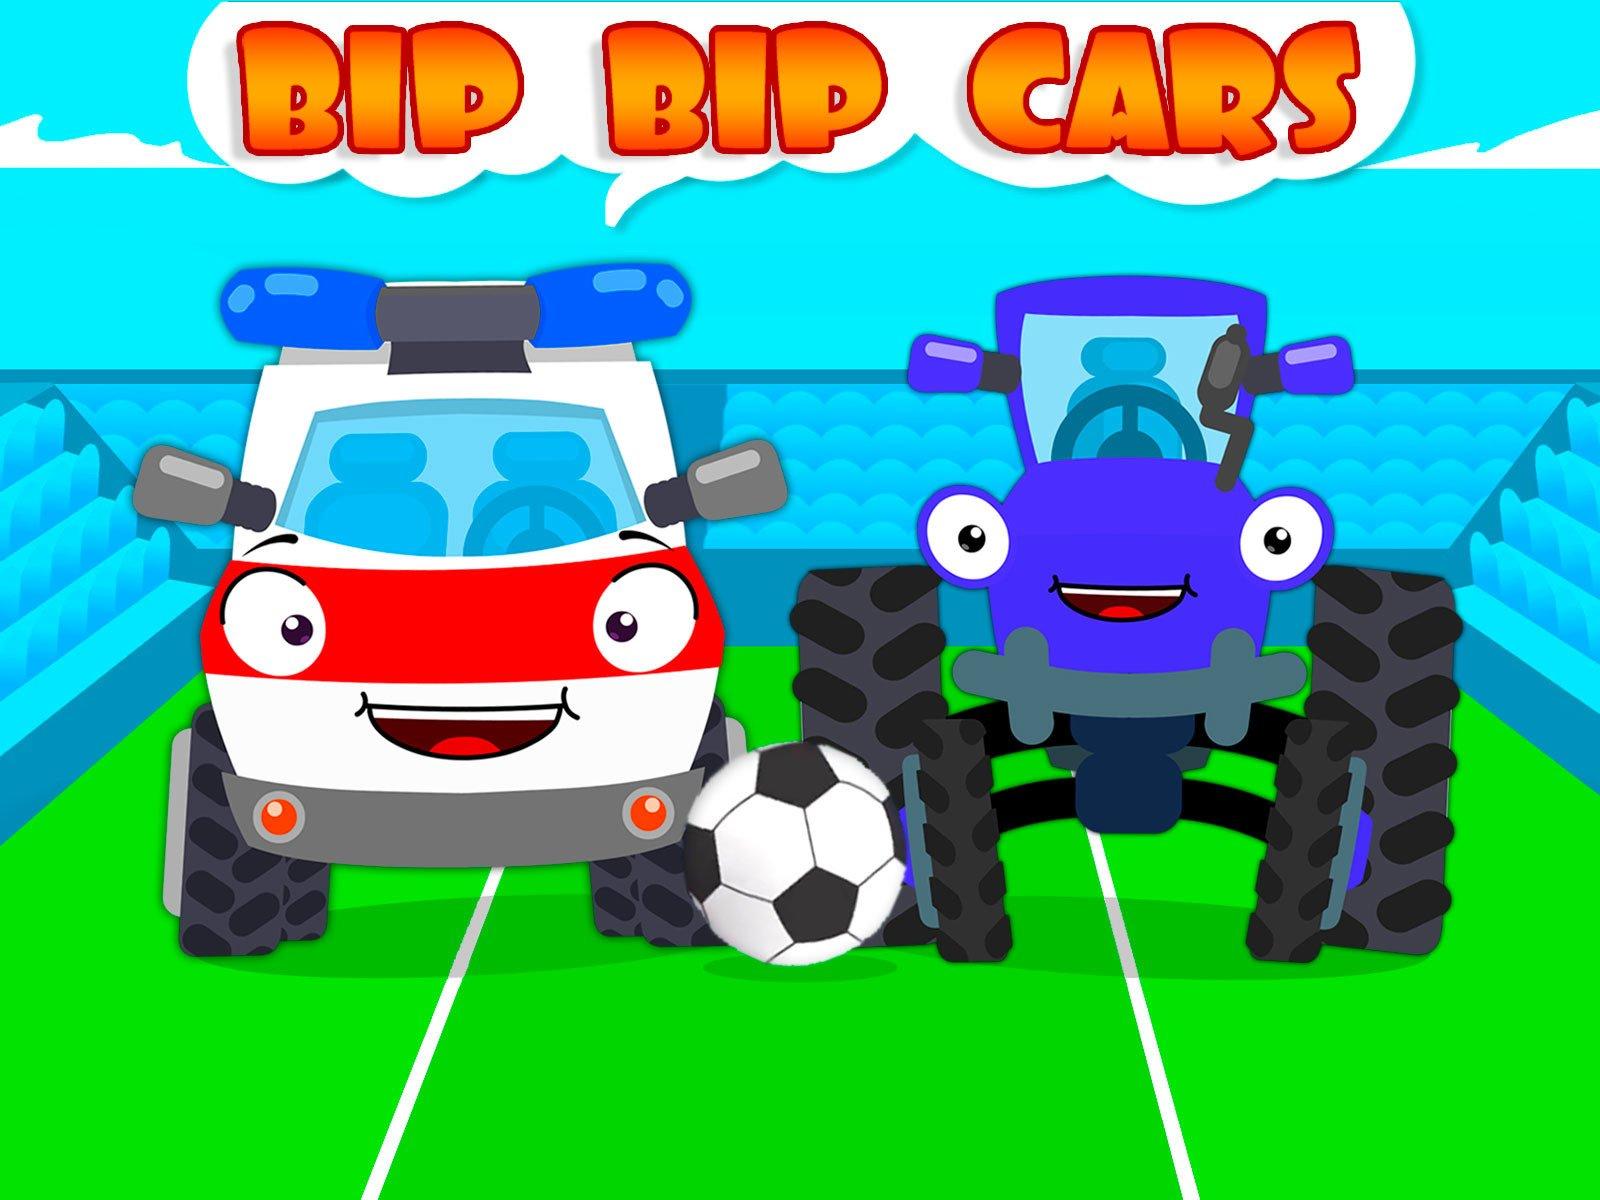 Bip Bip Cars - Season 3